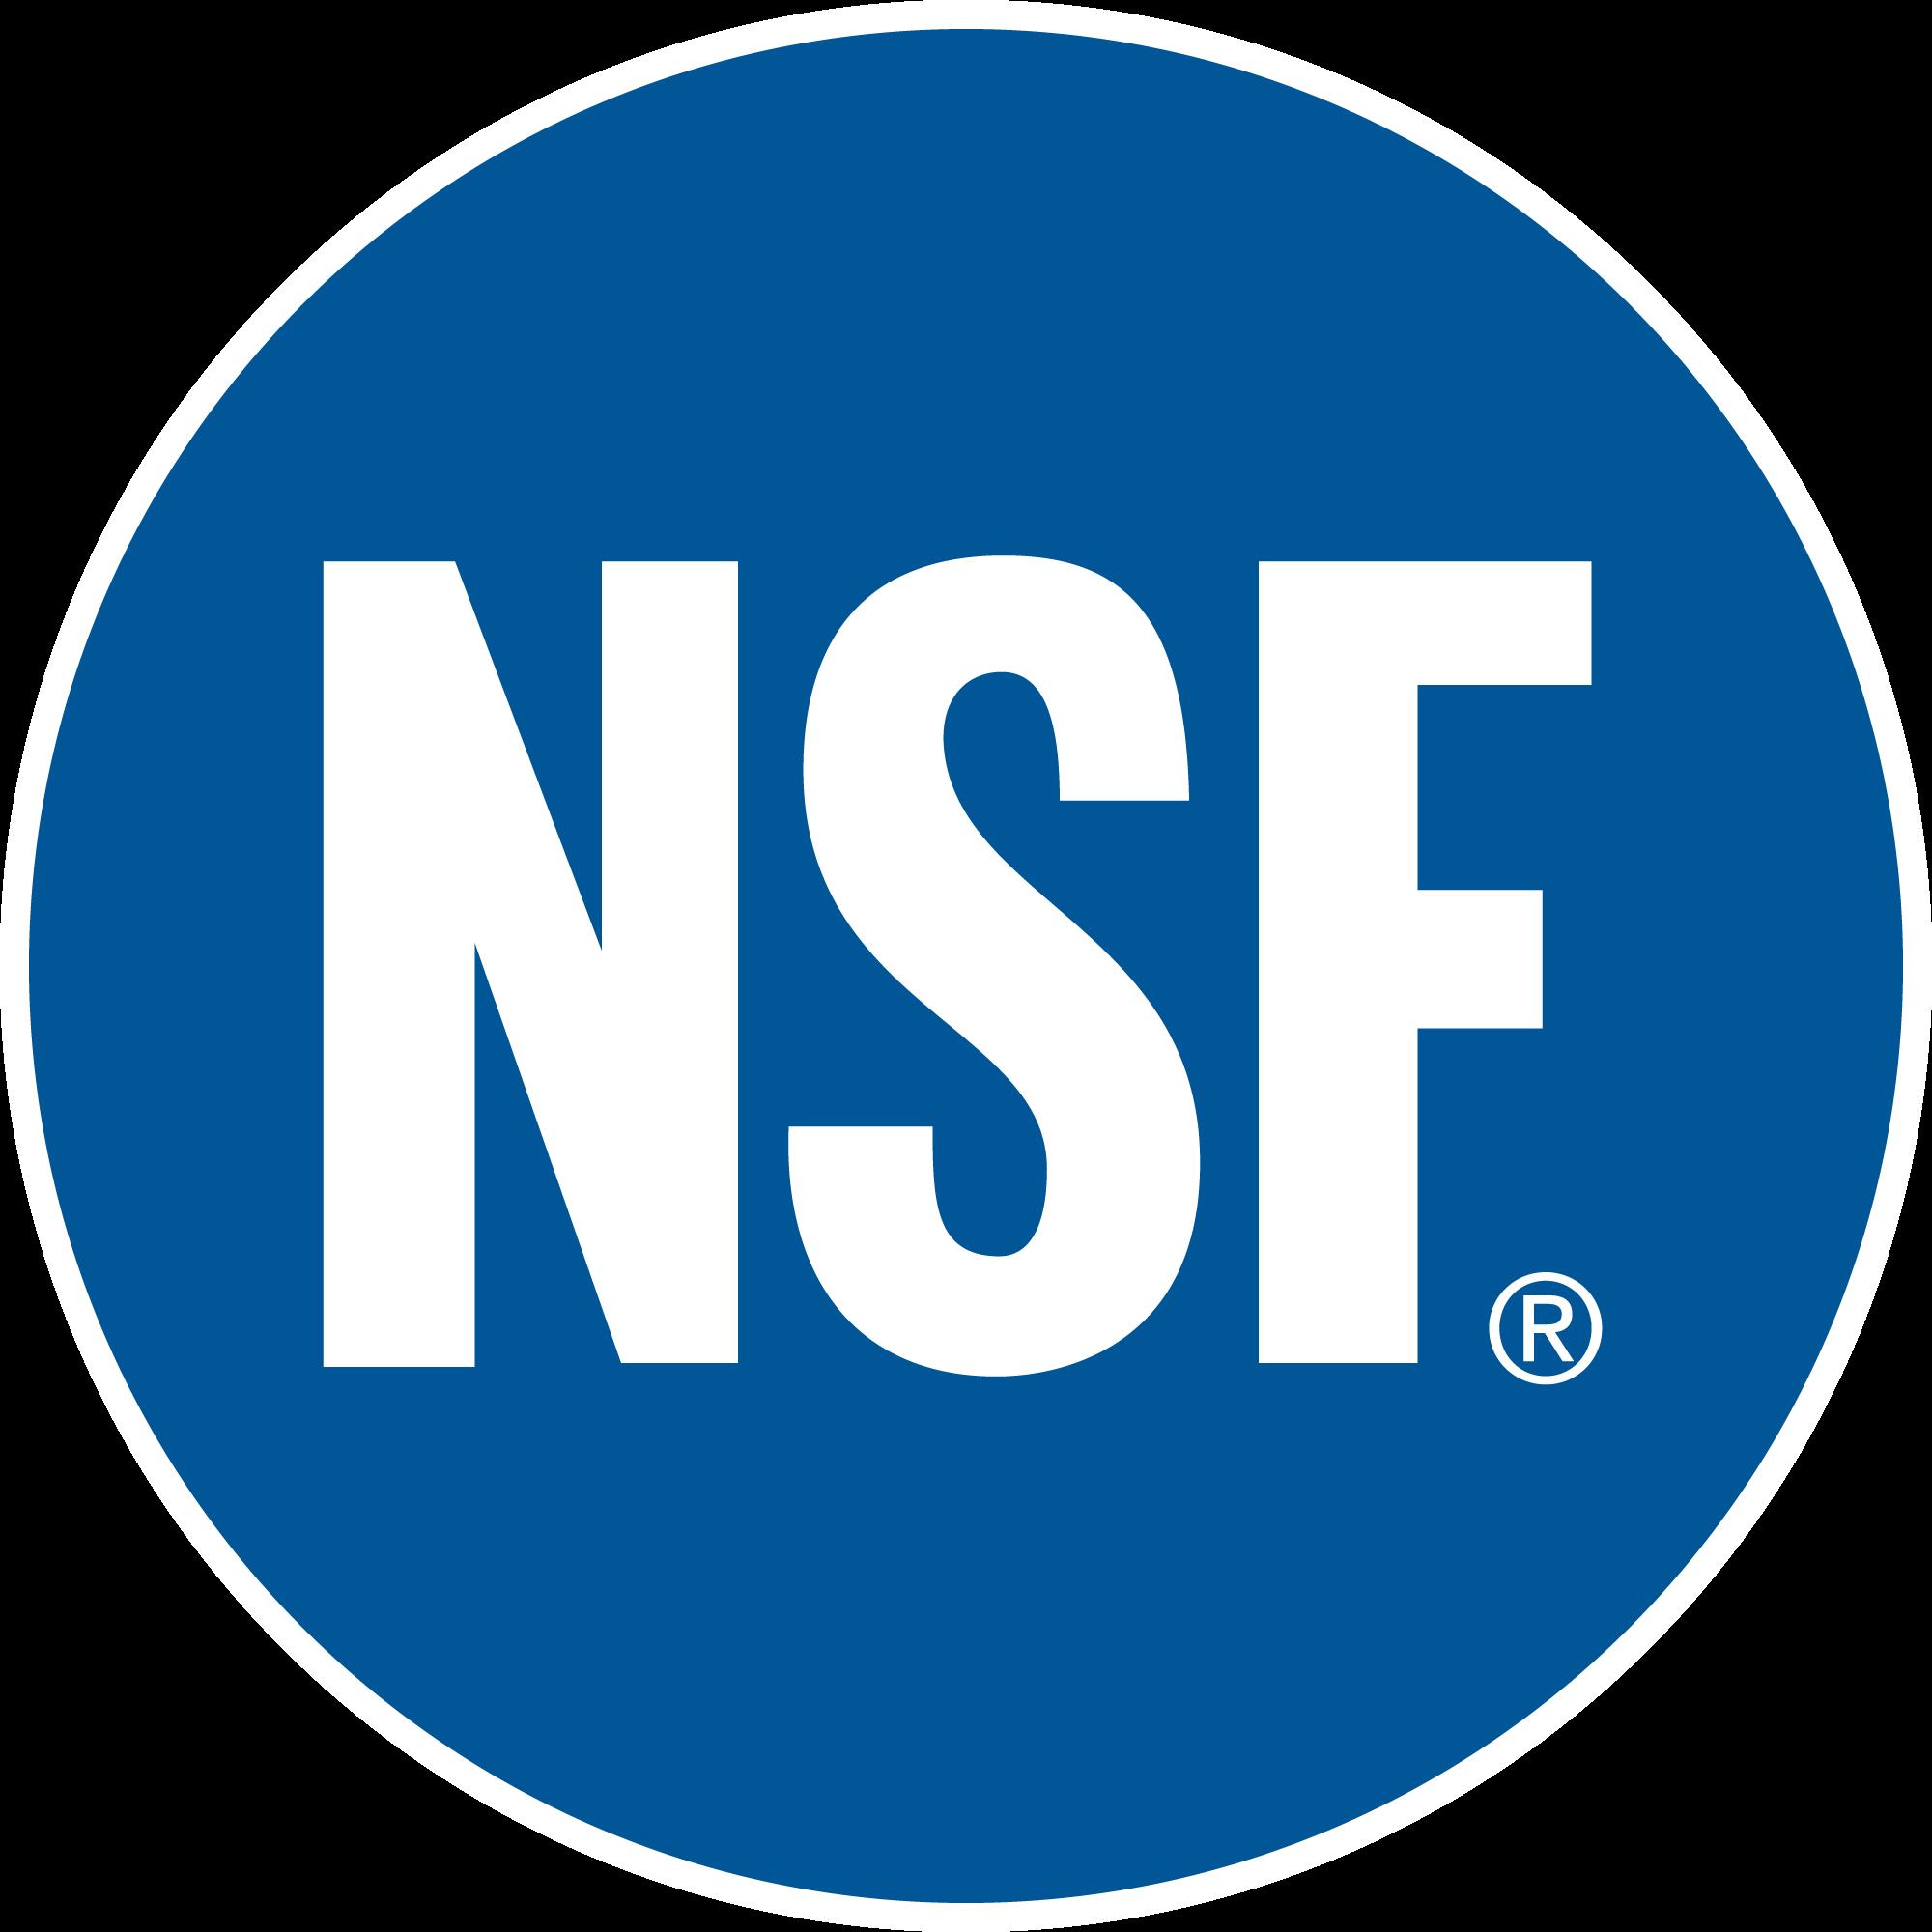 nsf-logo-blue.png